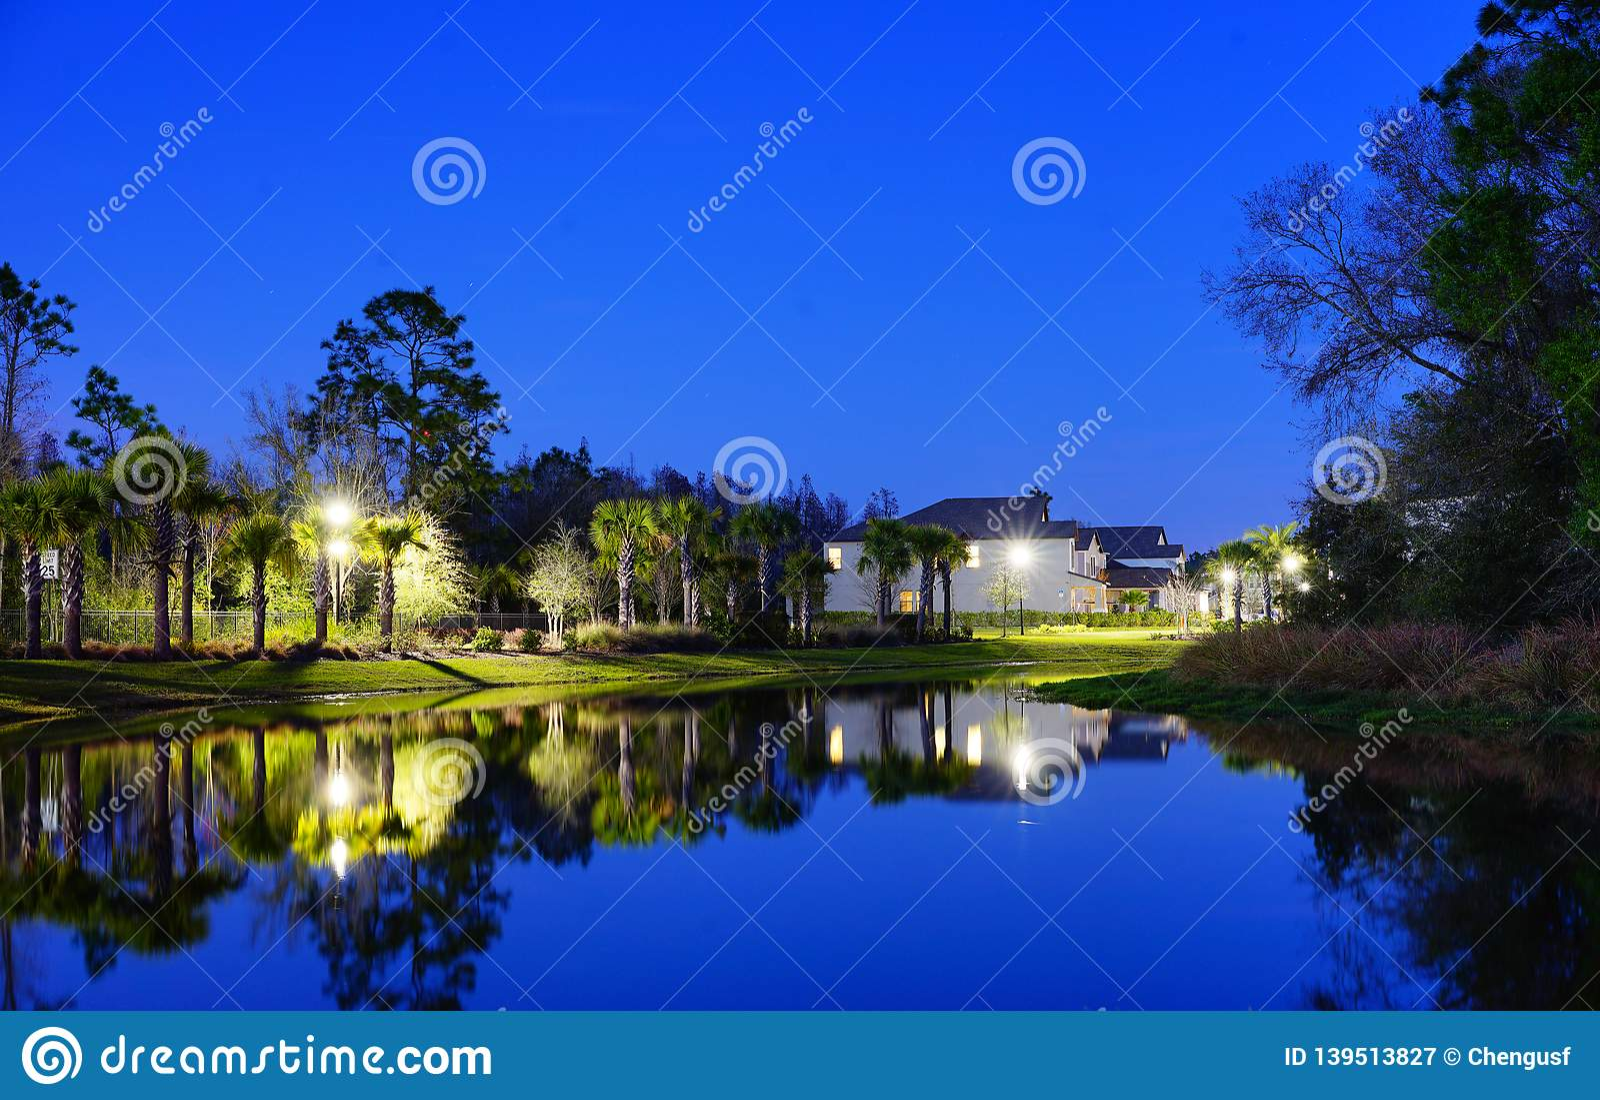 Ett typisk Florida hus